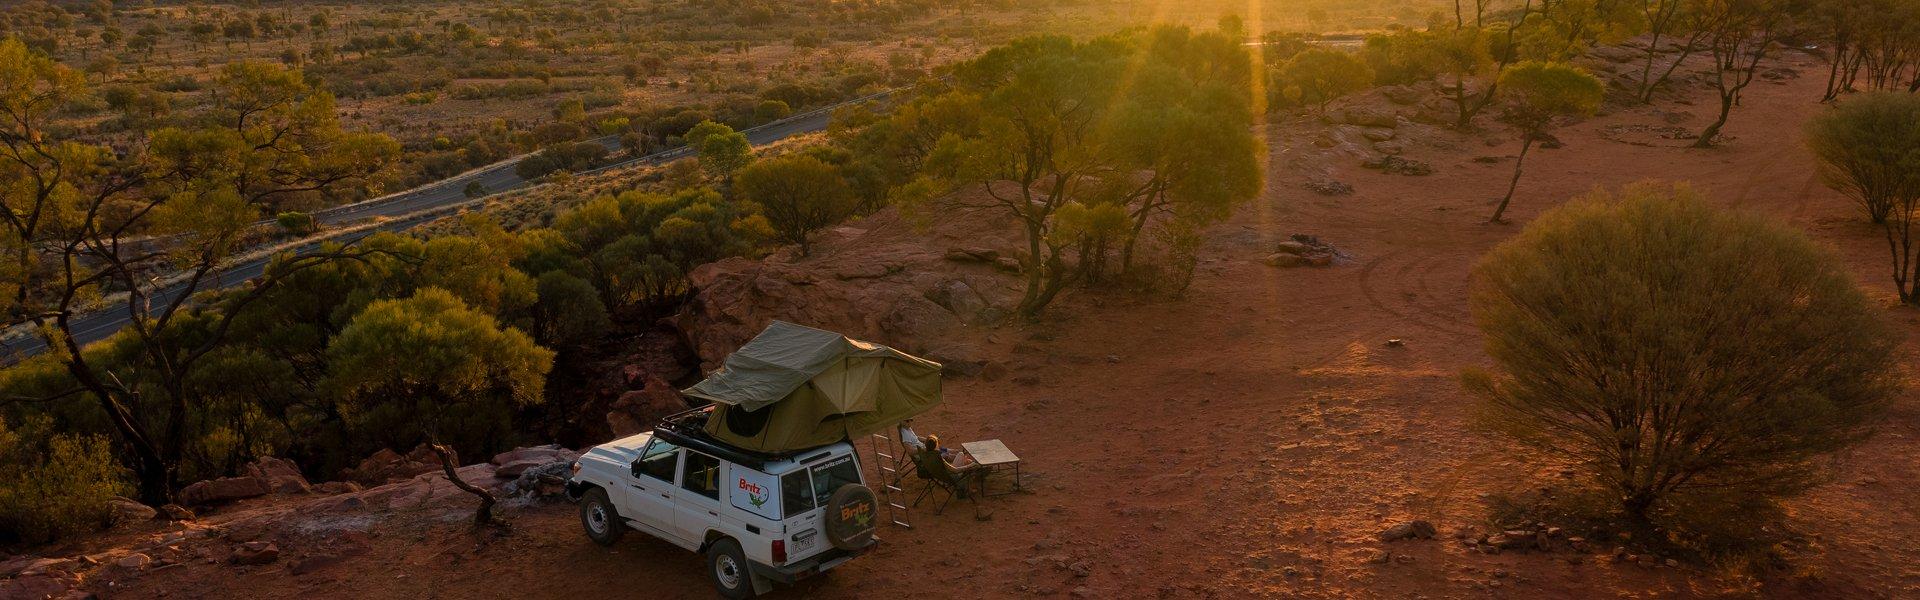 Campervakantie Australië